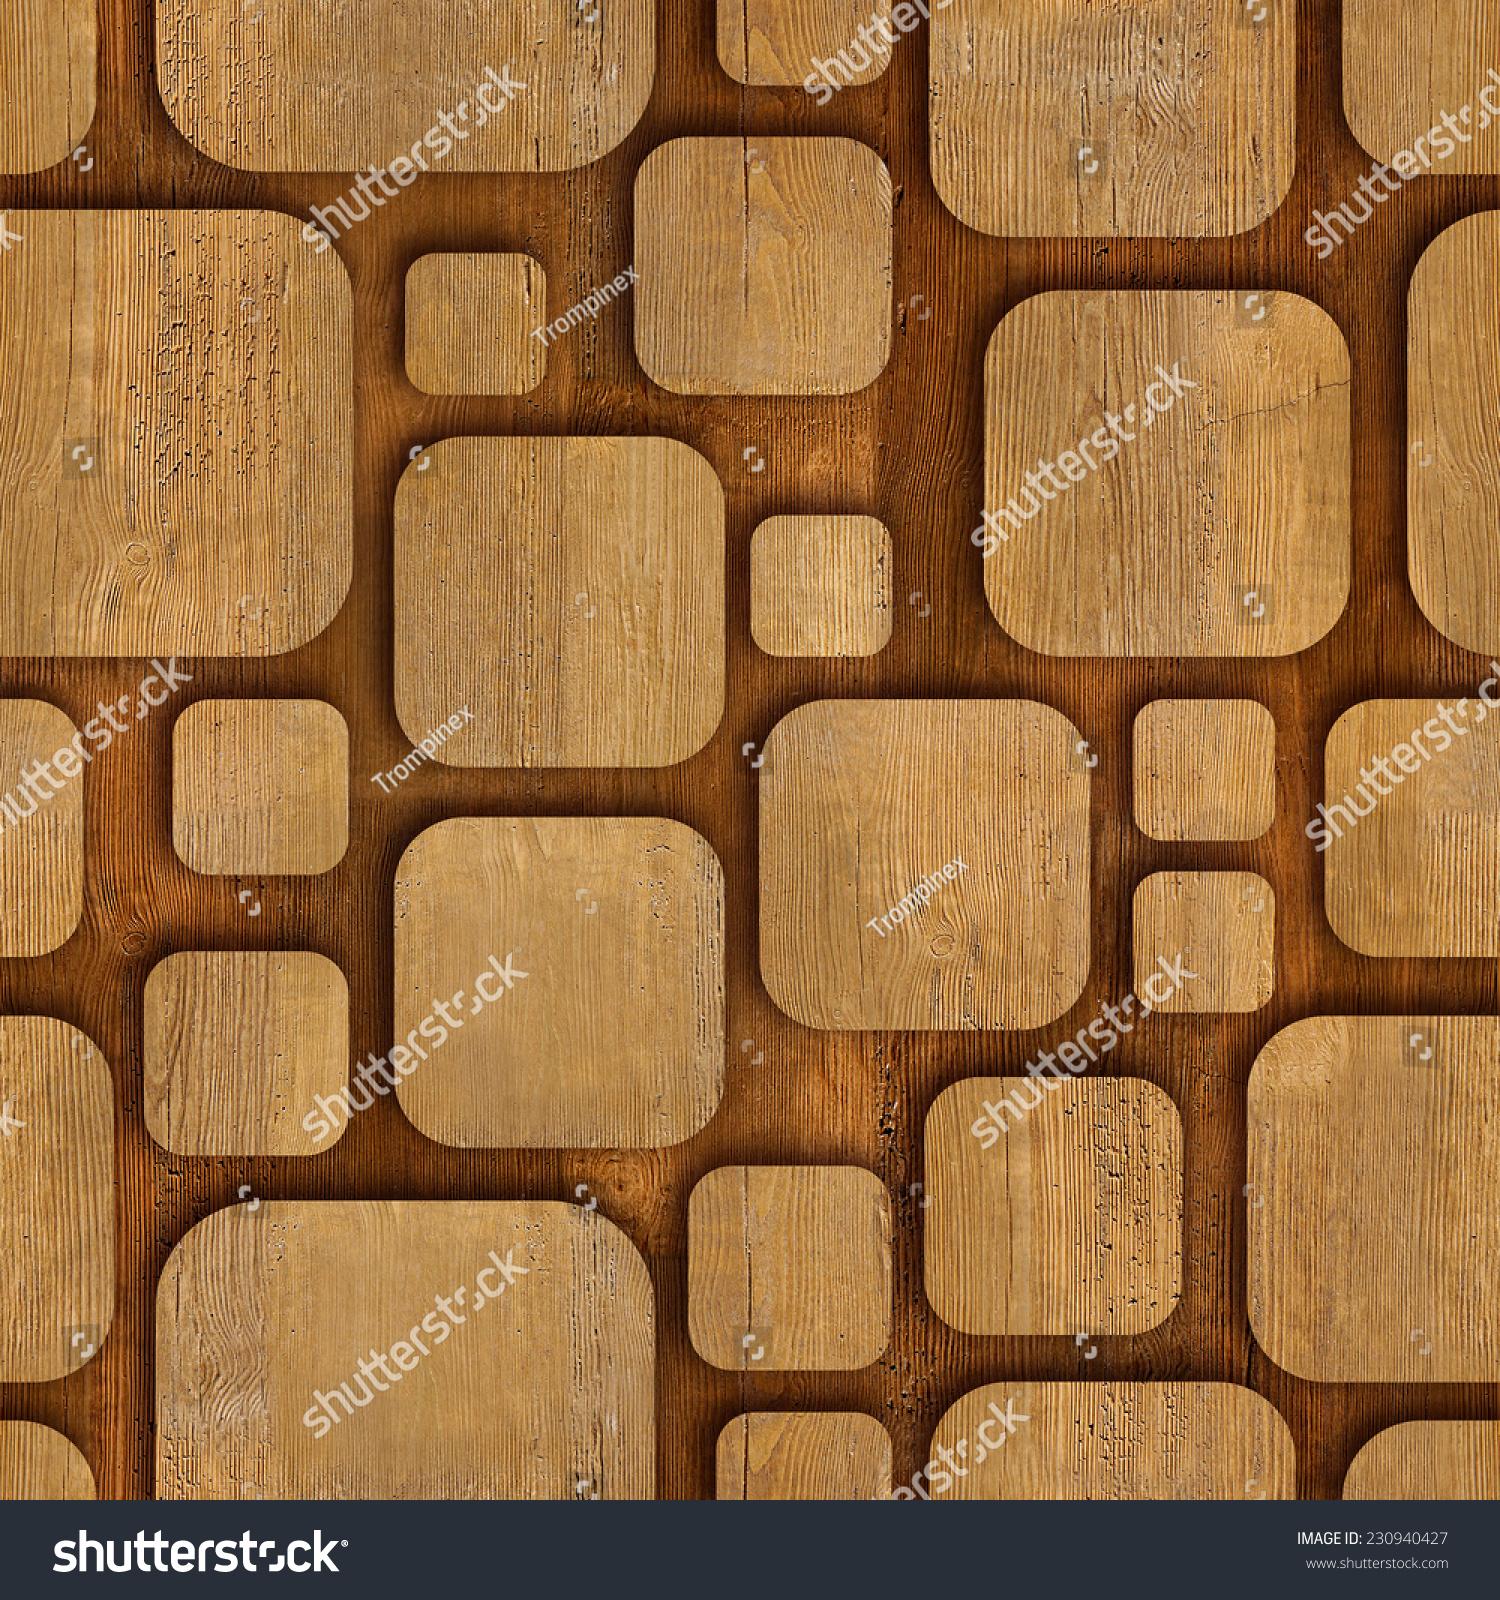 Geometric Wooden Blocks Seamless Background Abstract Stock Photo ...